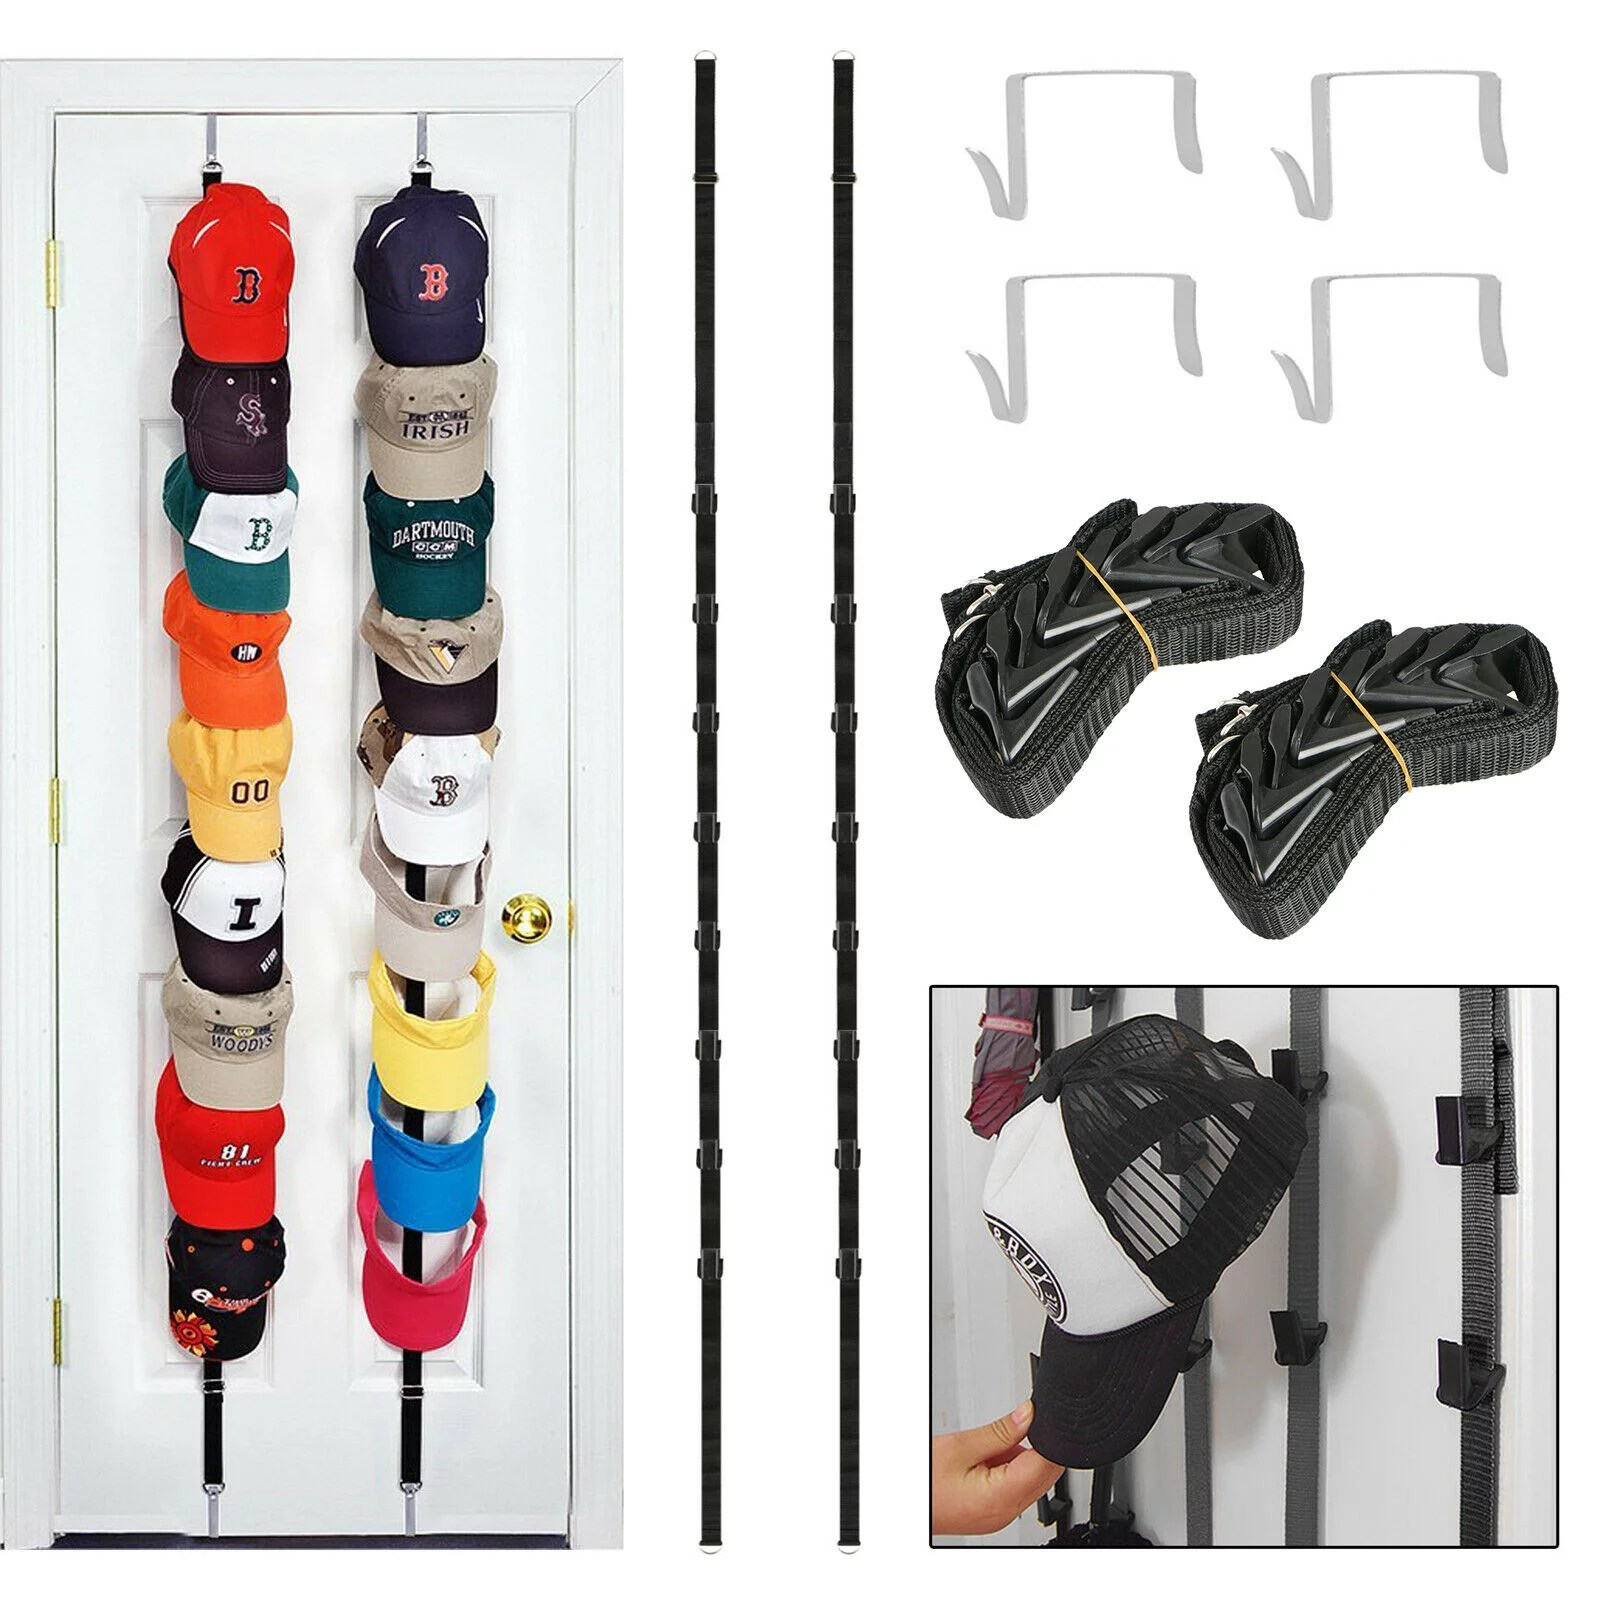 tsv 2pcs cap rack cap hanging shelf baseball cap hat holder rack hangers storage organizer over the door holds up to 16 caps for wall closet best